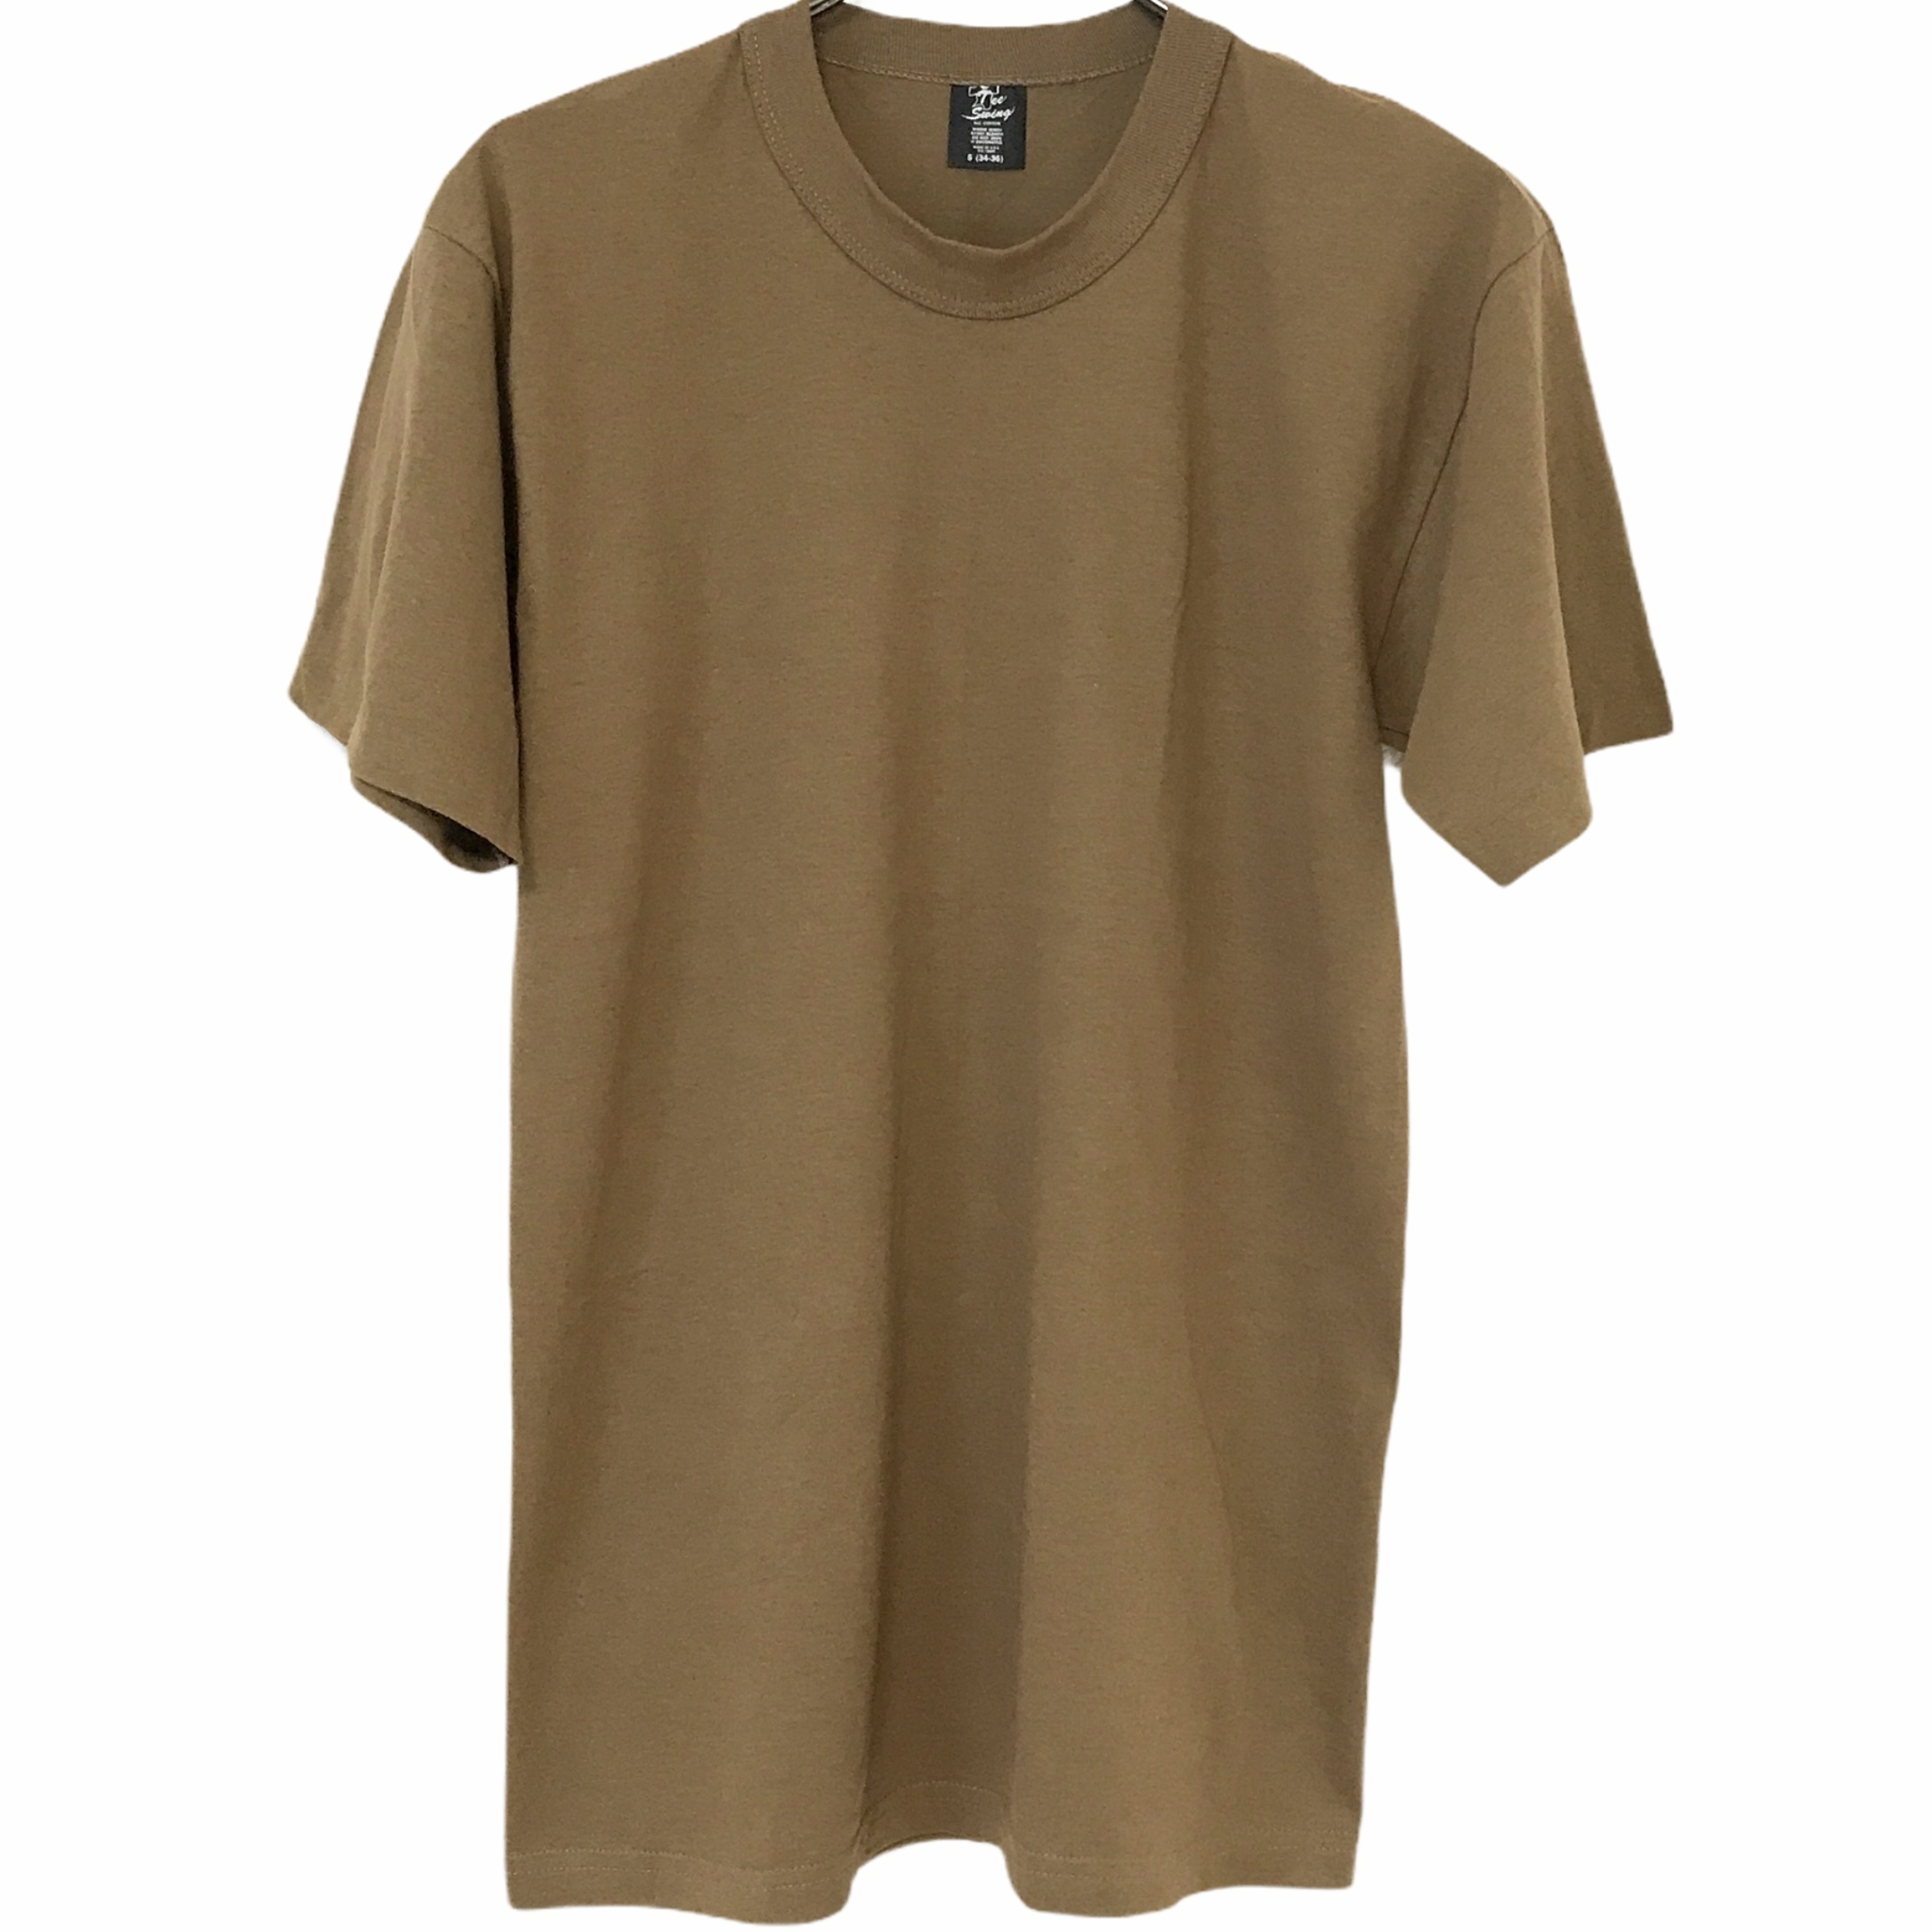 Dead Stock! 80's Tee Swing T-shirt made in USA Khaki